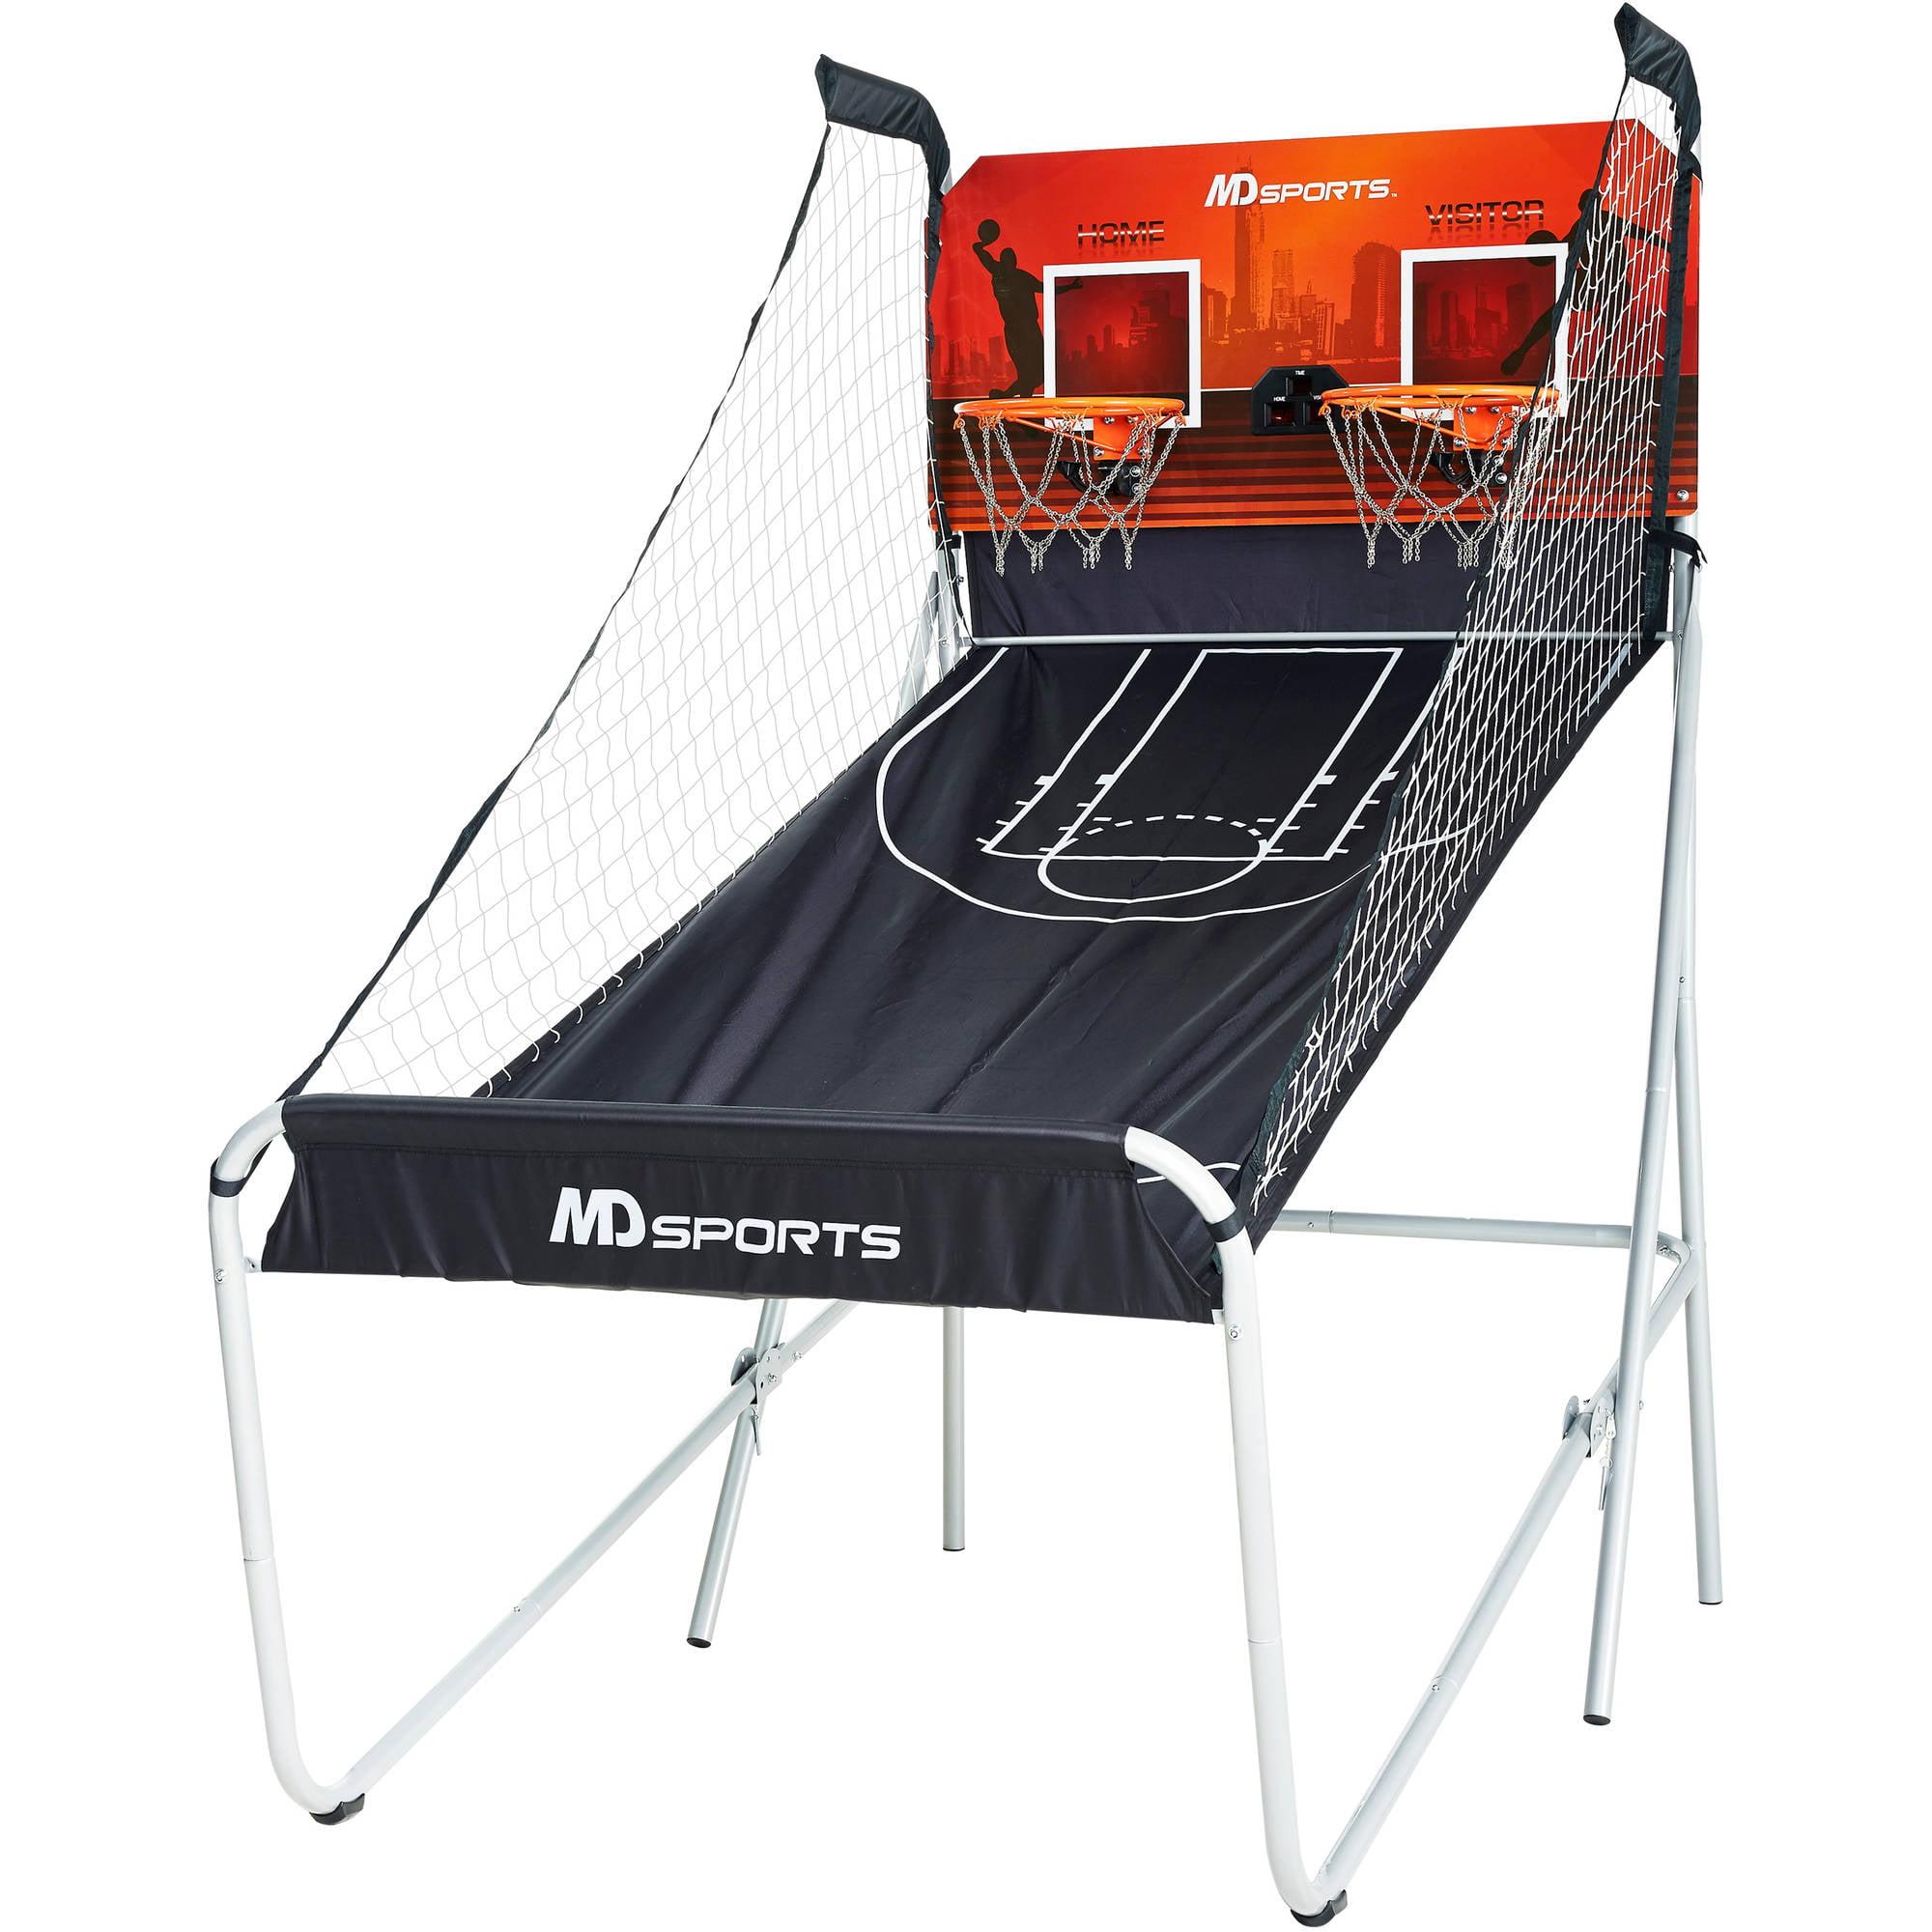 Md Sports Premium 2 Player Basketball Ga   Walmart.com